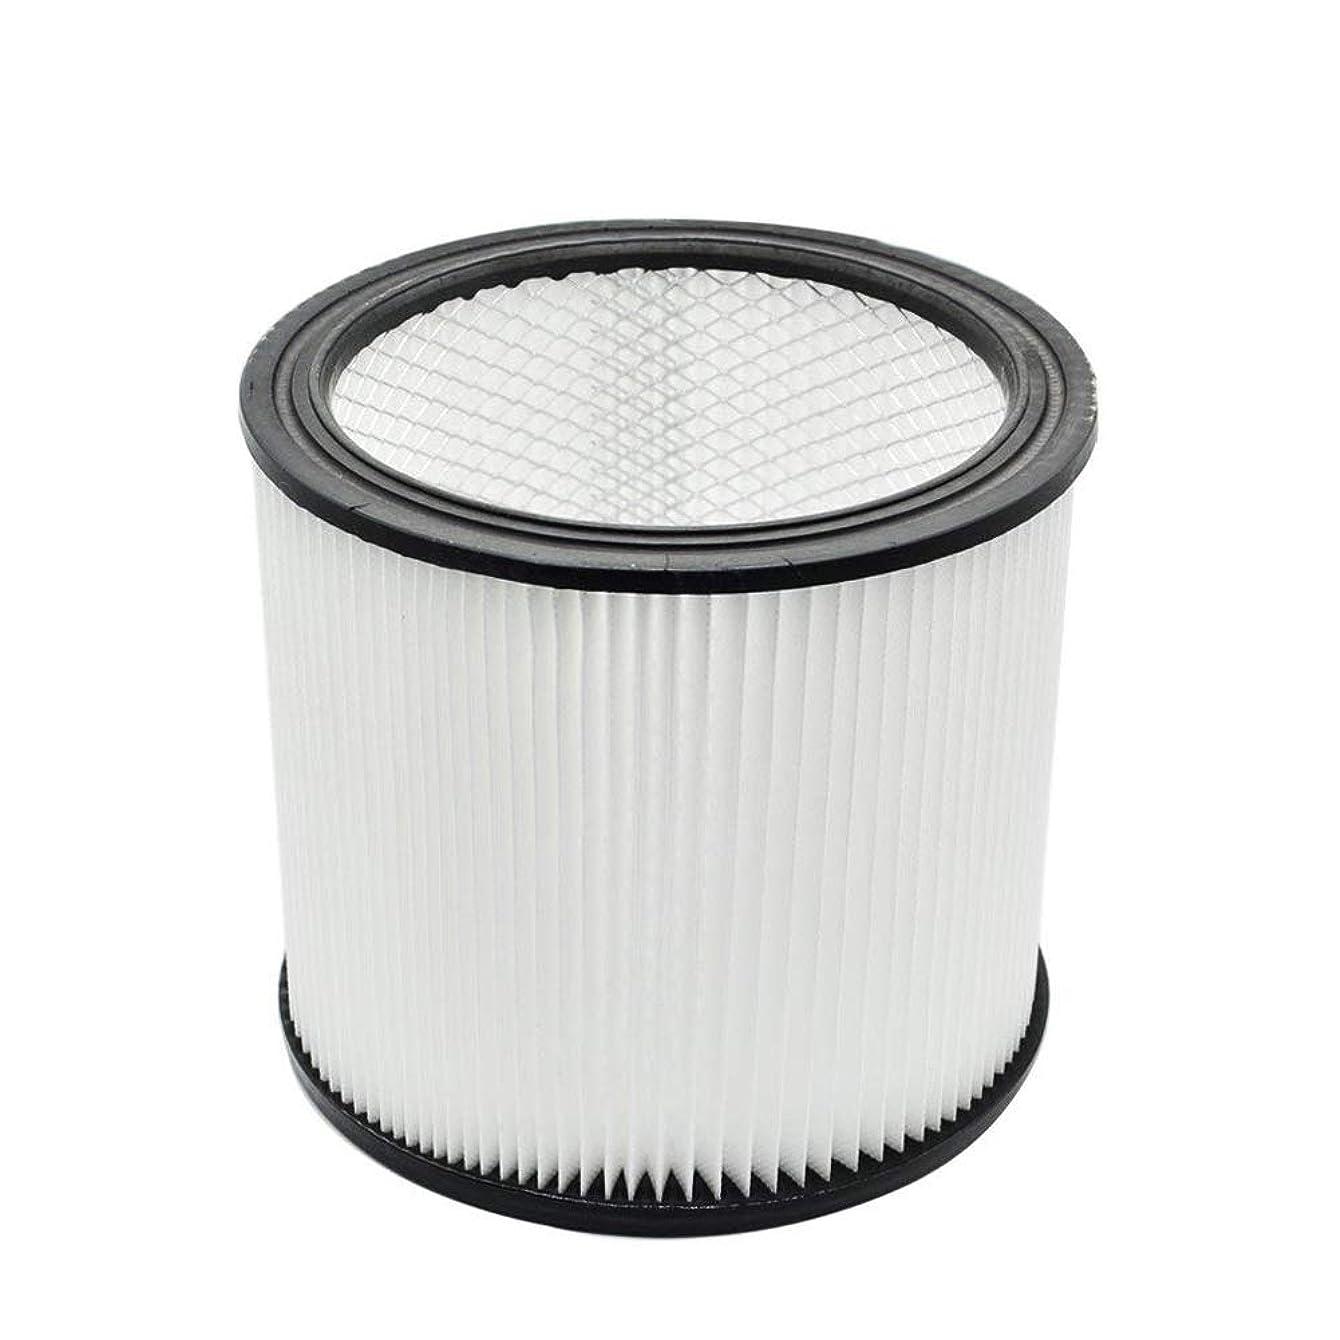 EZ SPARES 1 Pack Replacement Vacuum Cleaner Parts of Shop Vac Filter Fit Shop-vac 90304 9030400 903-04-00 9034 Dry Wet Cartridge Filter